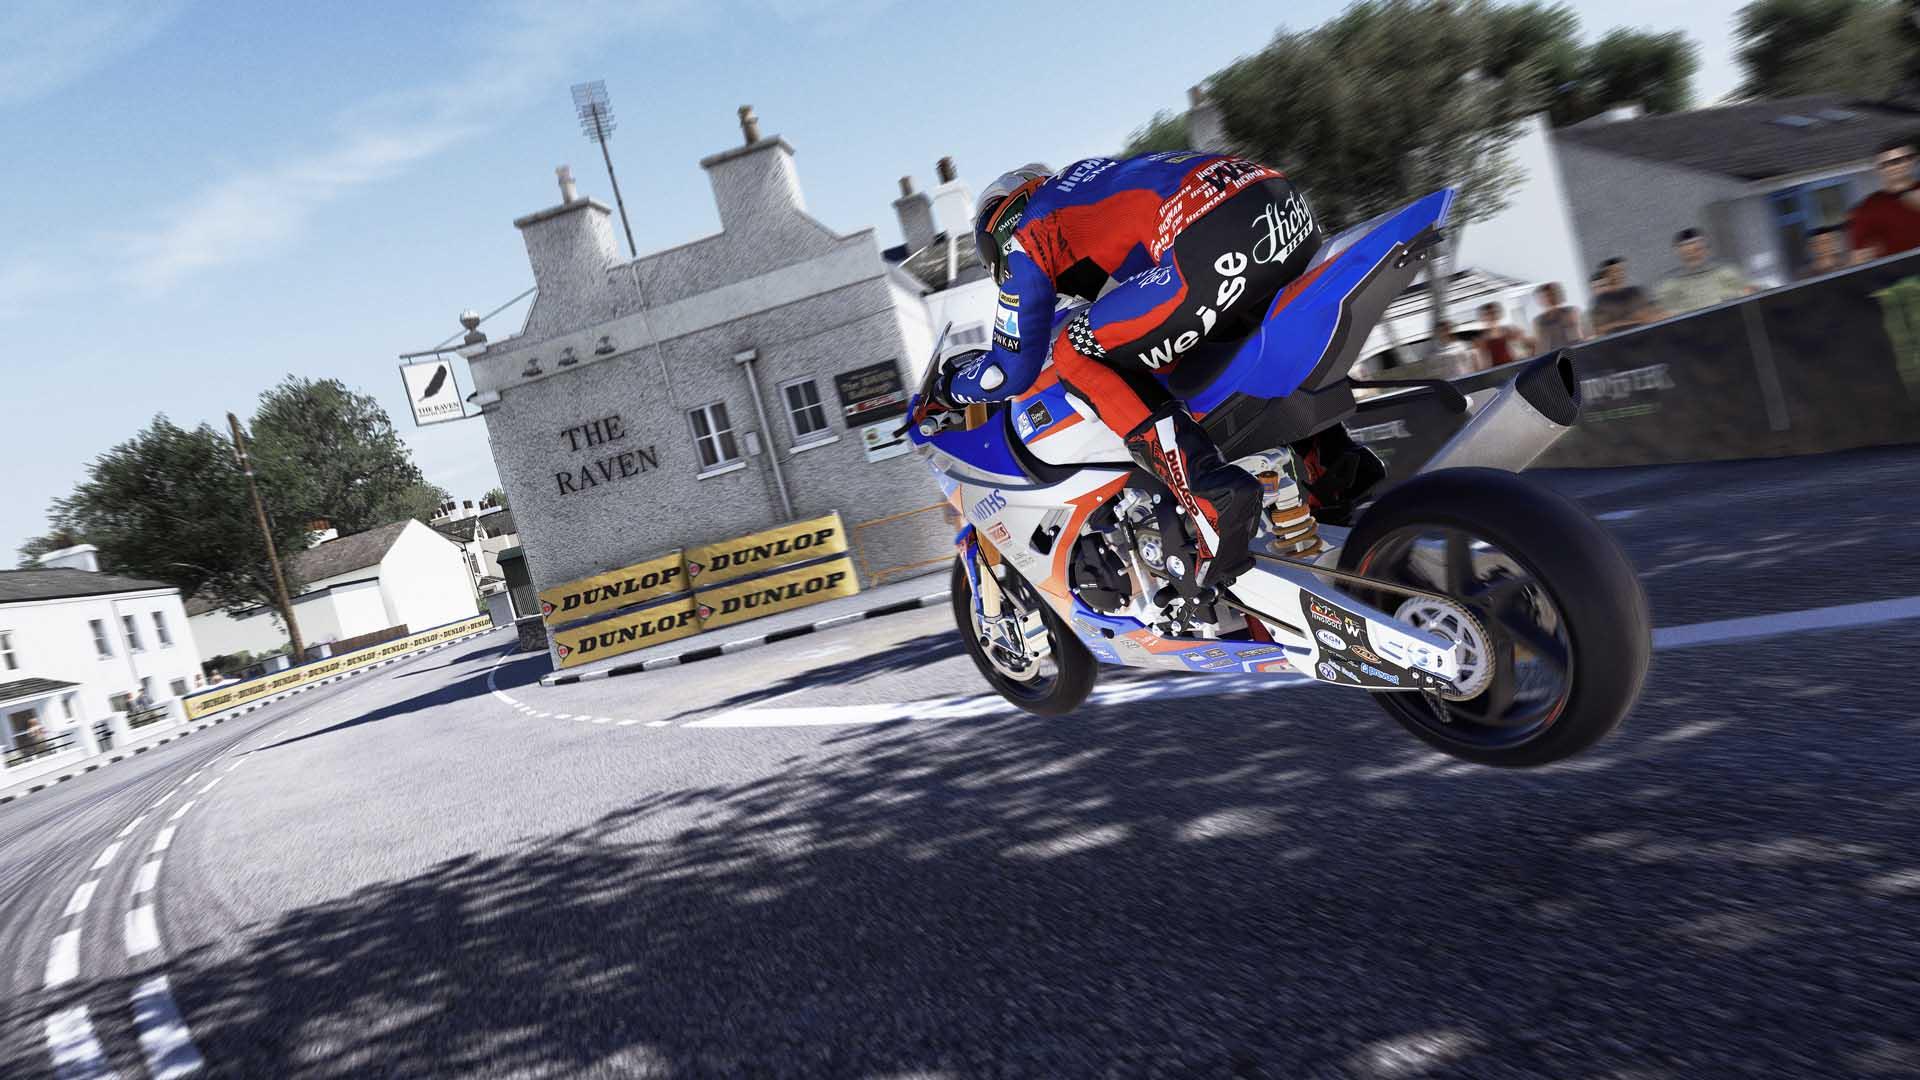 Análisis de TT Isla de Man: Ride on the Edge 2 - Xbox One 2